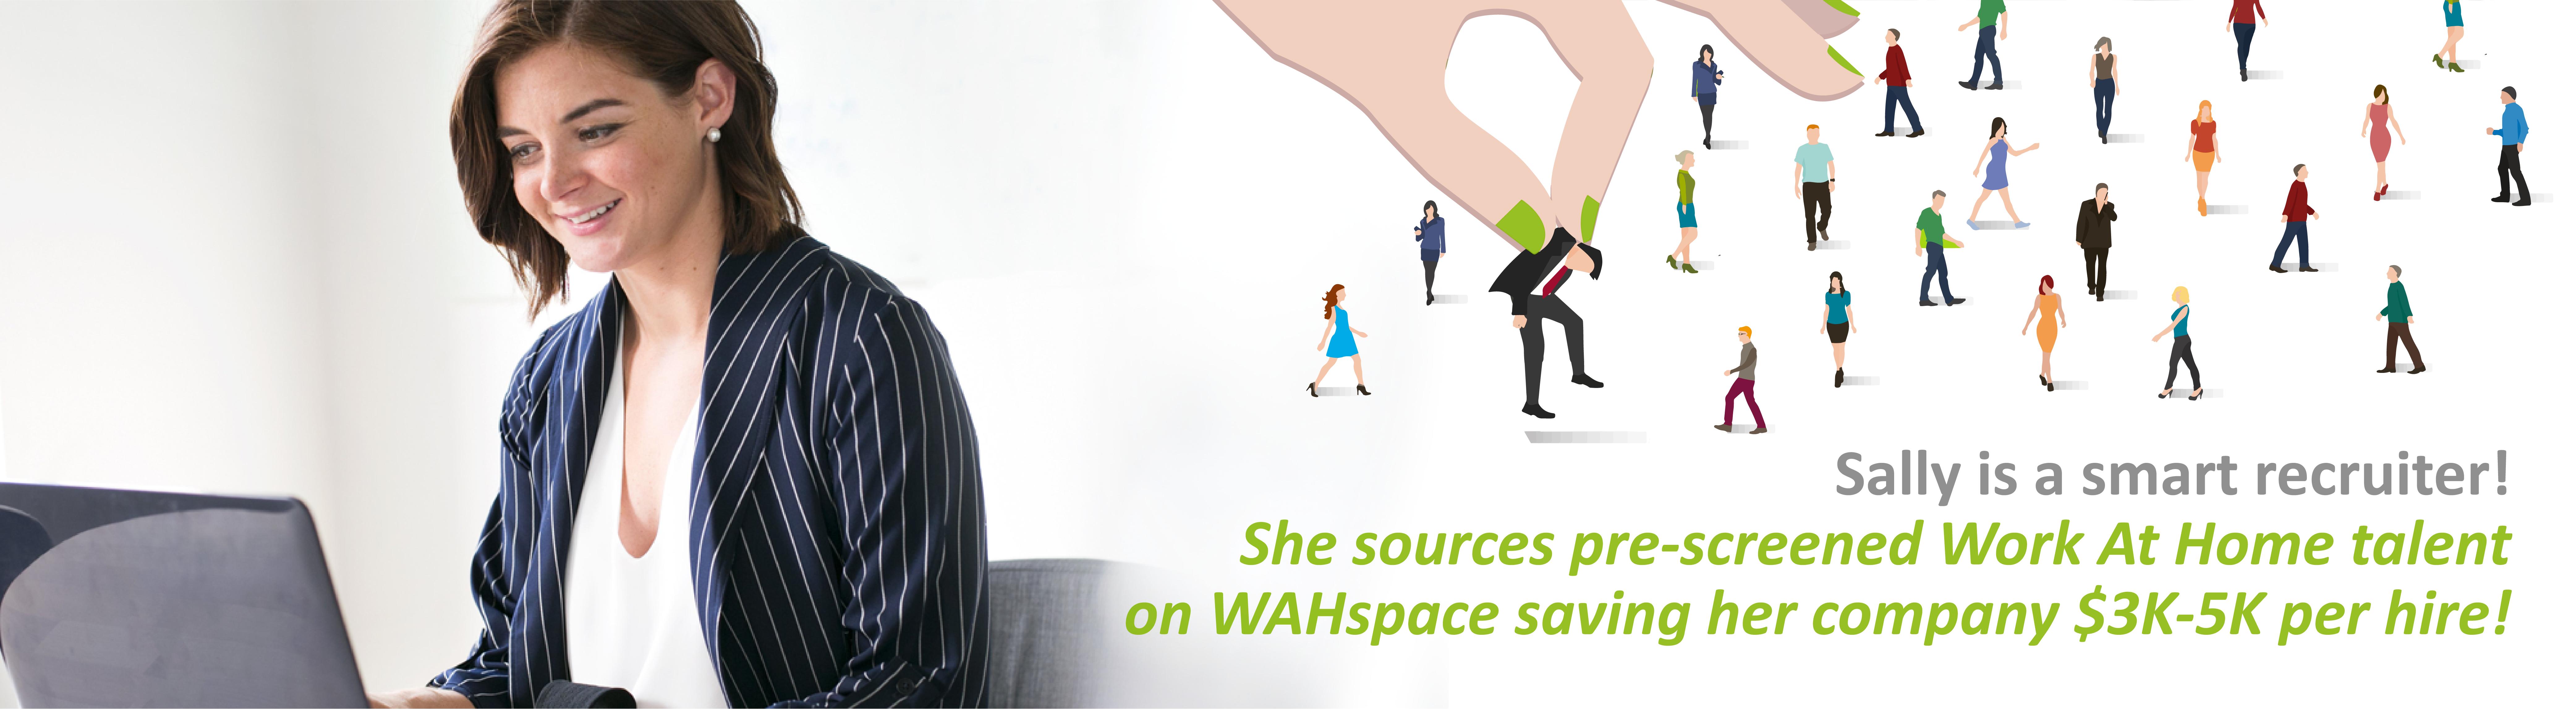 wahspace